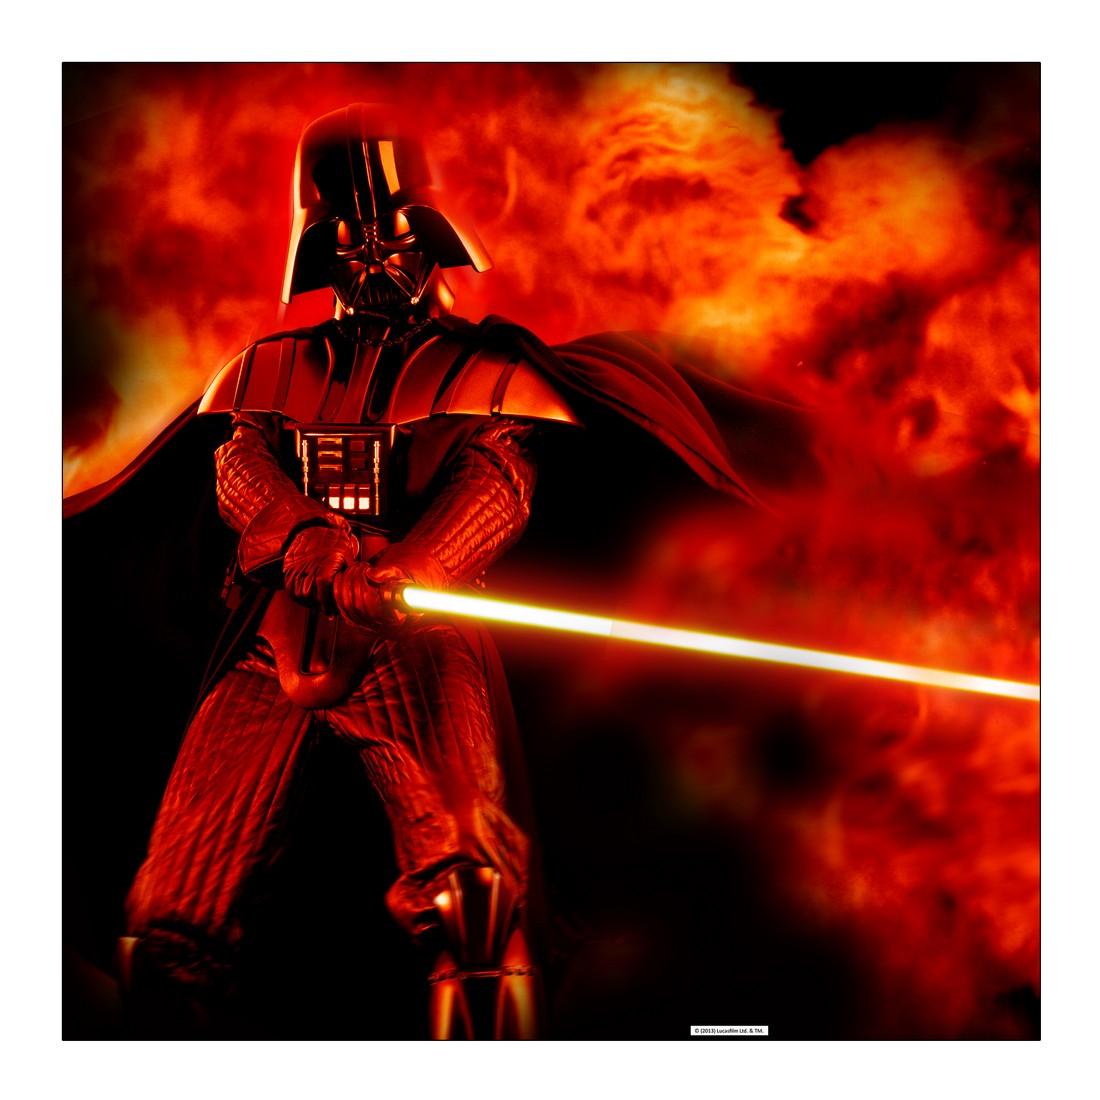 Leinwandbild Darth Vader – Lightsaber Explosion – Abmessung 80×80 cm, Gallery of Innovative Art jetzt bestellen